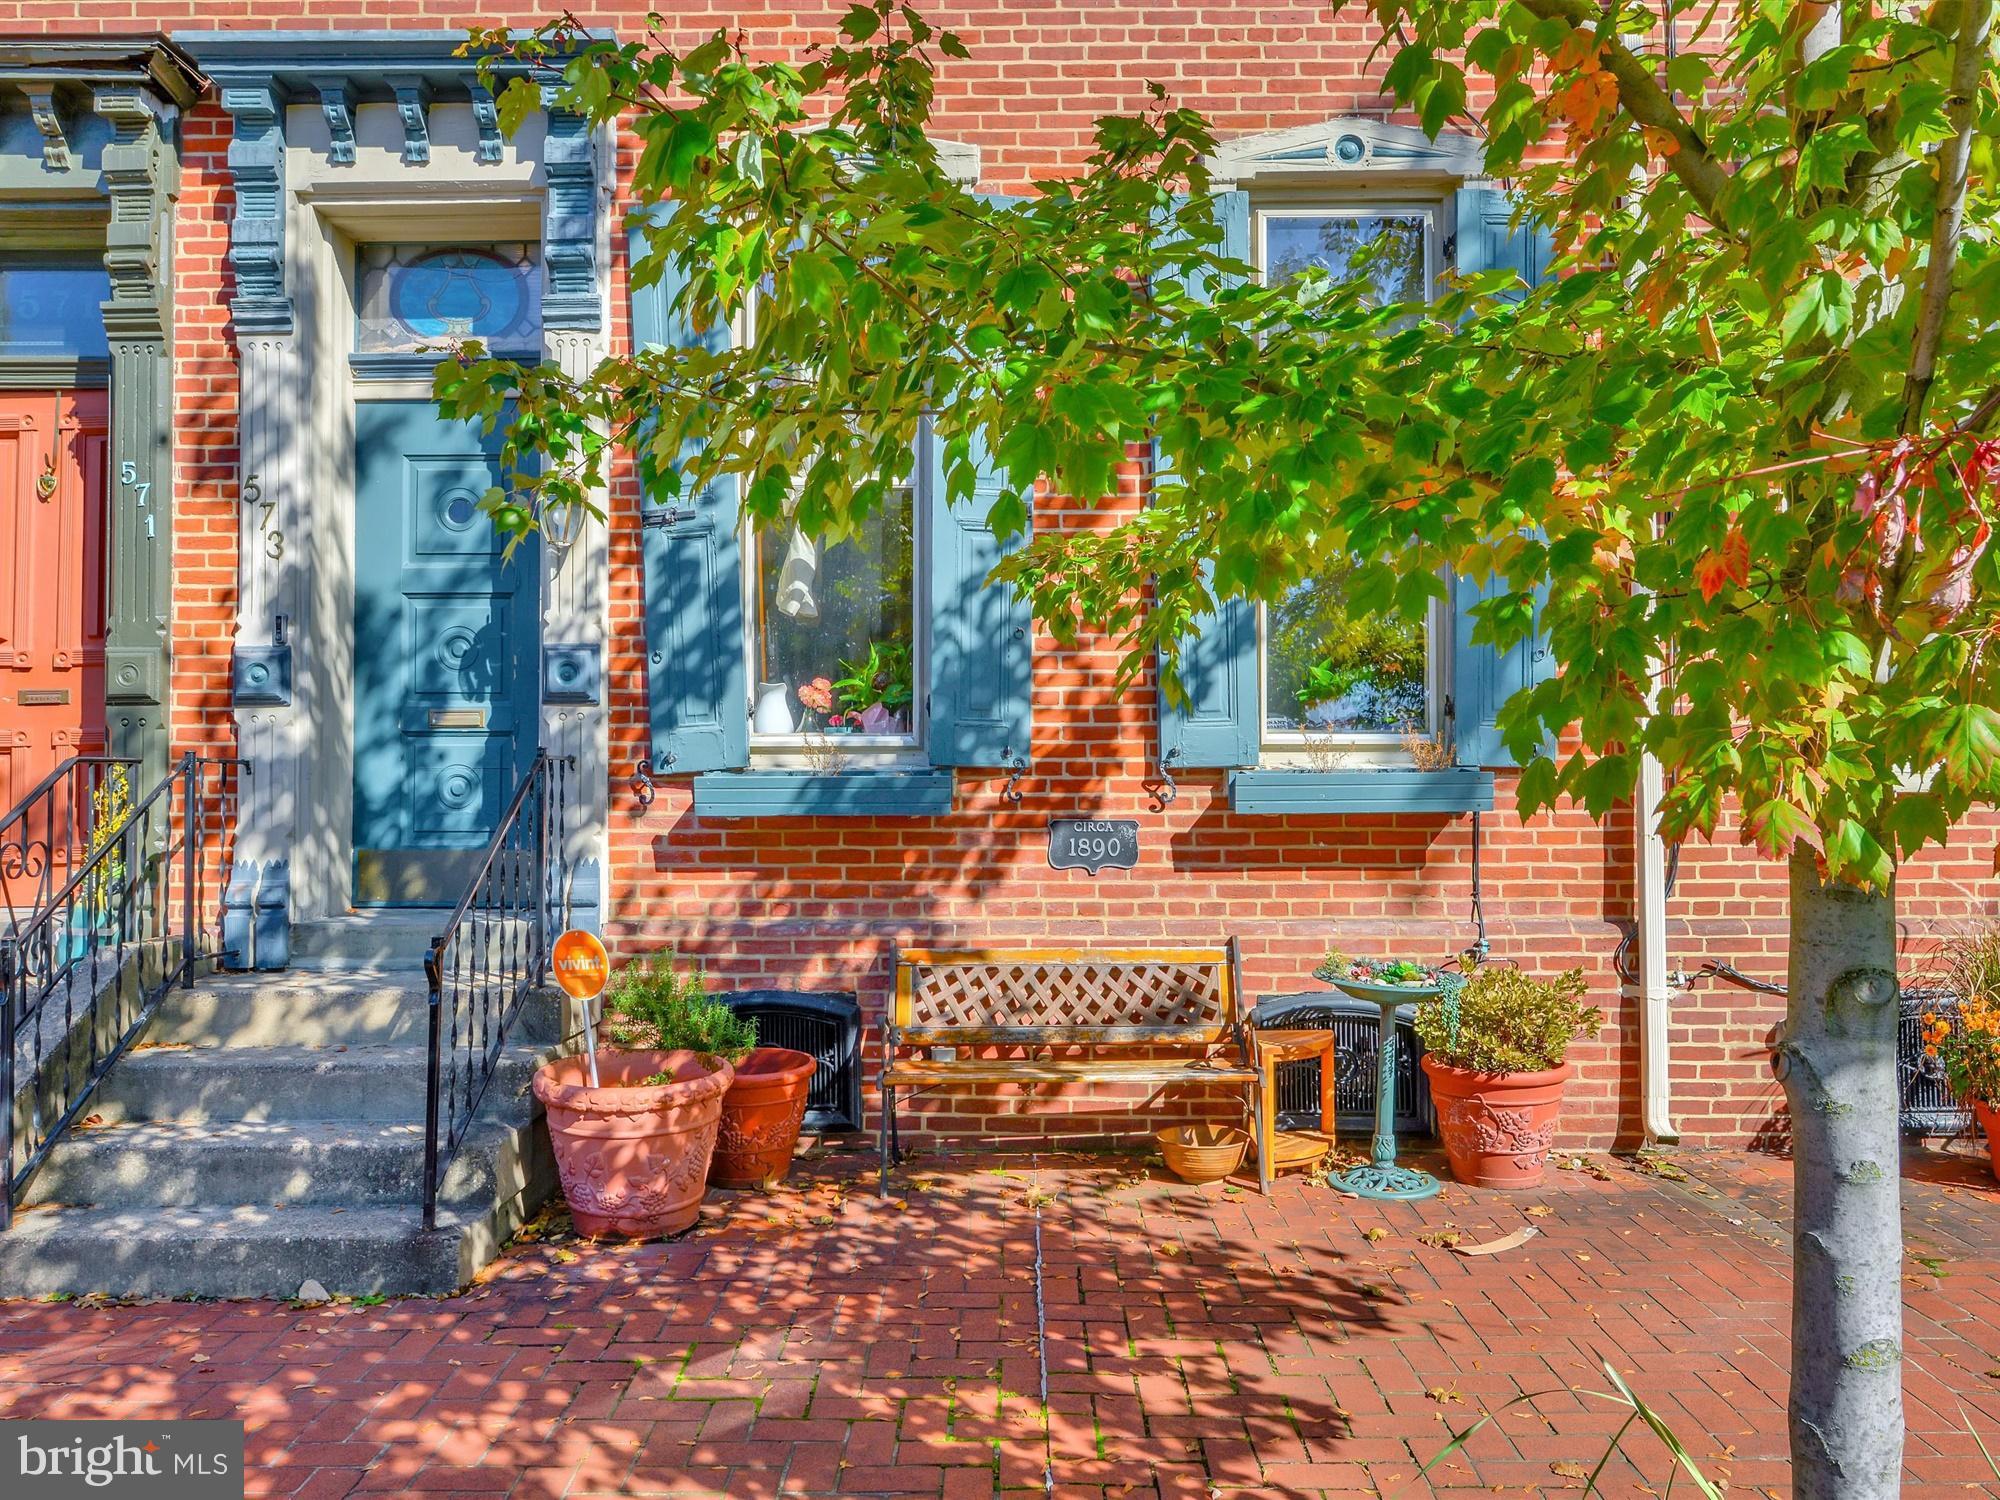 573 S FRONT STREET, HARRISBURG, PA 17104